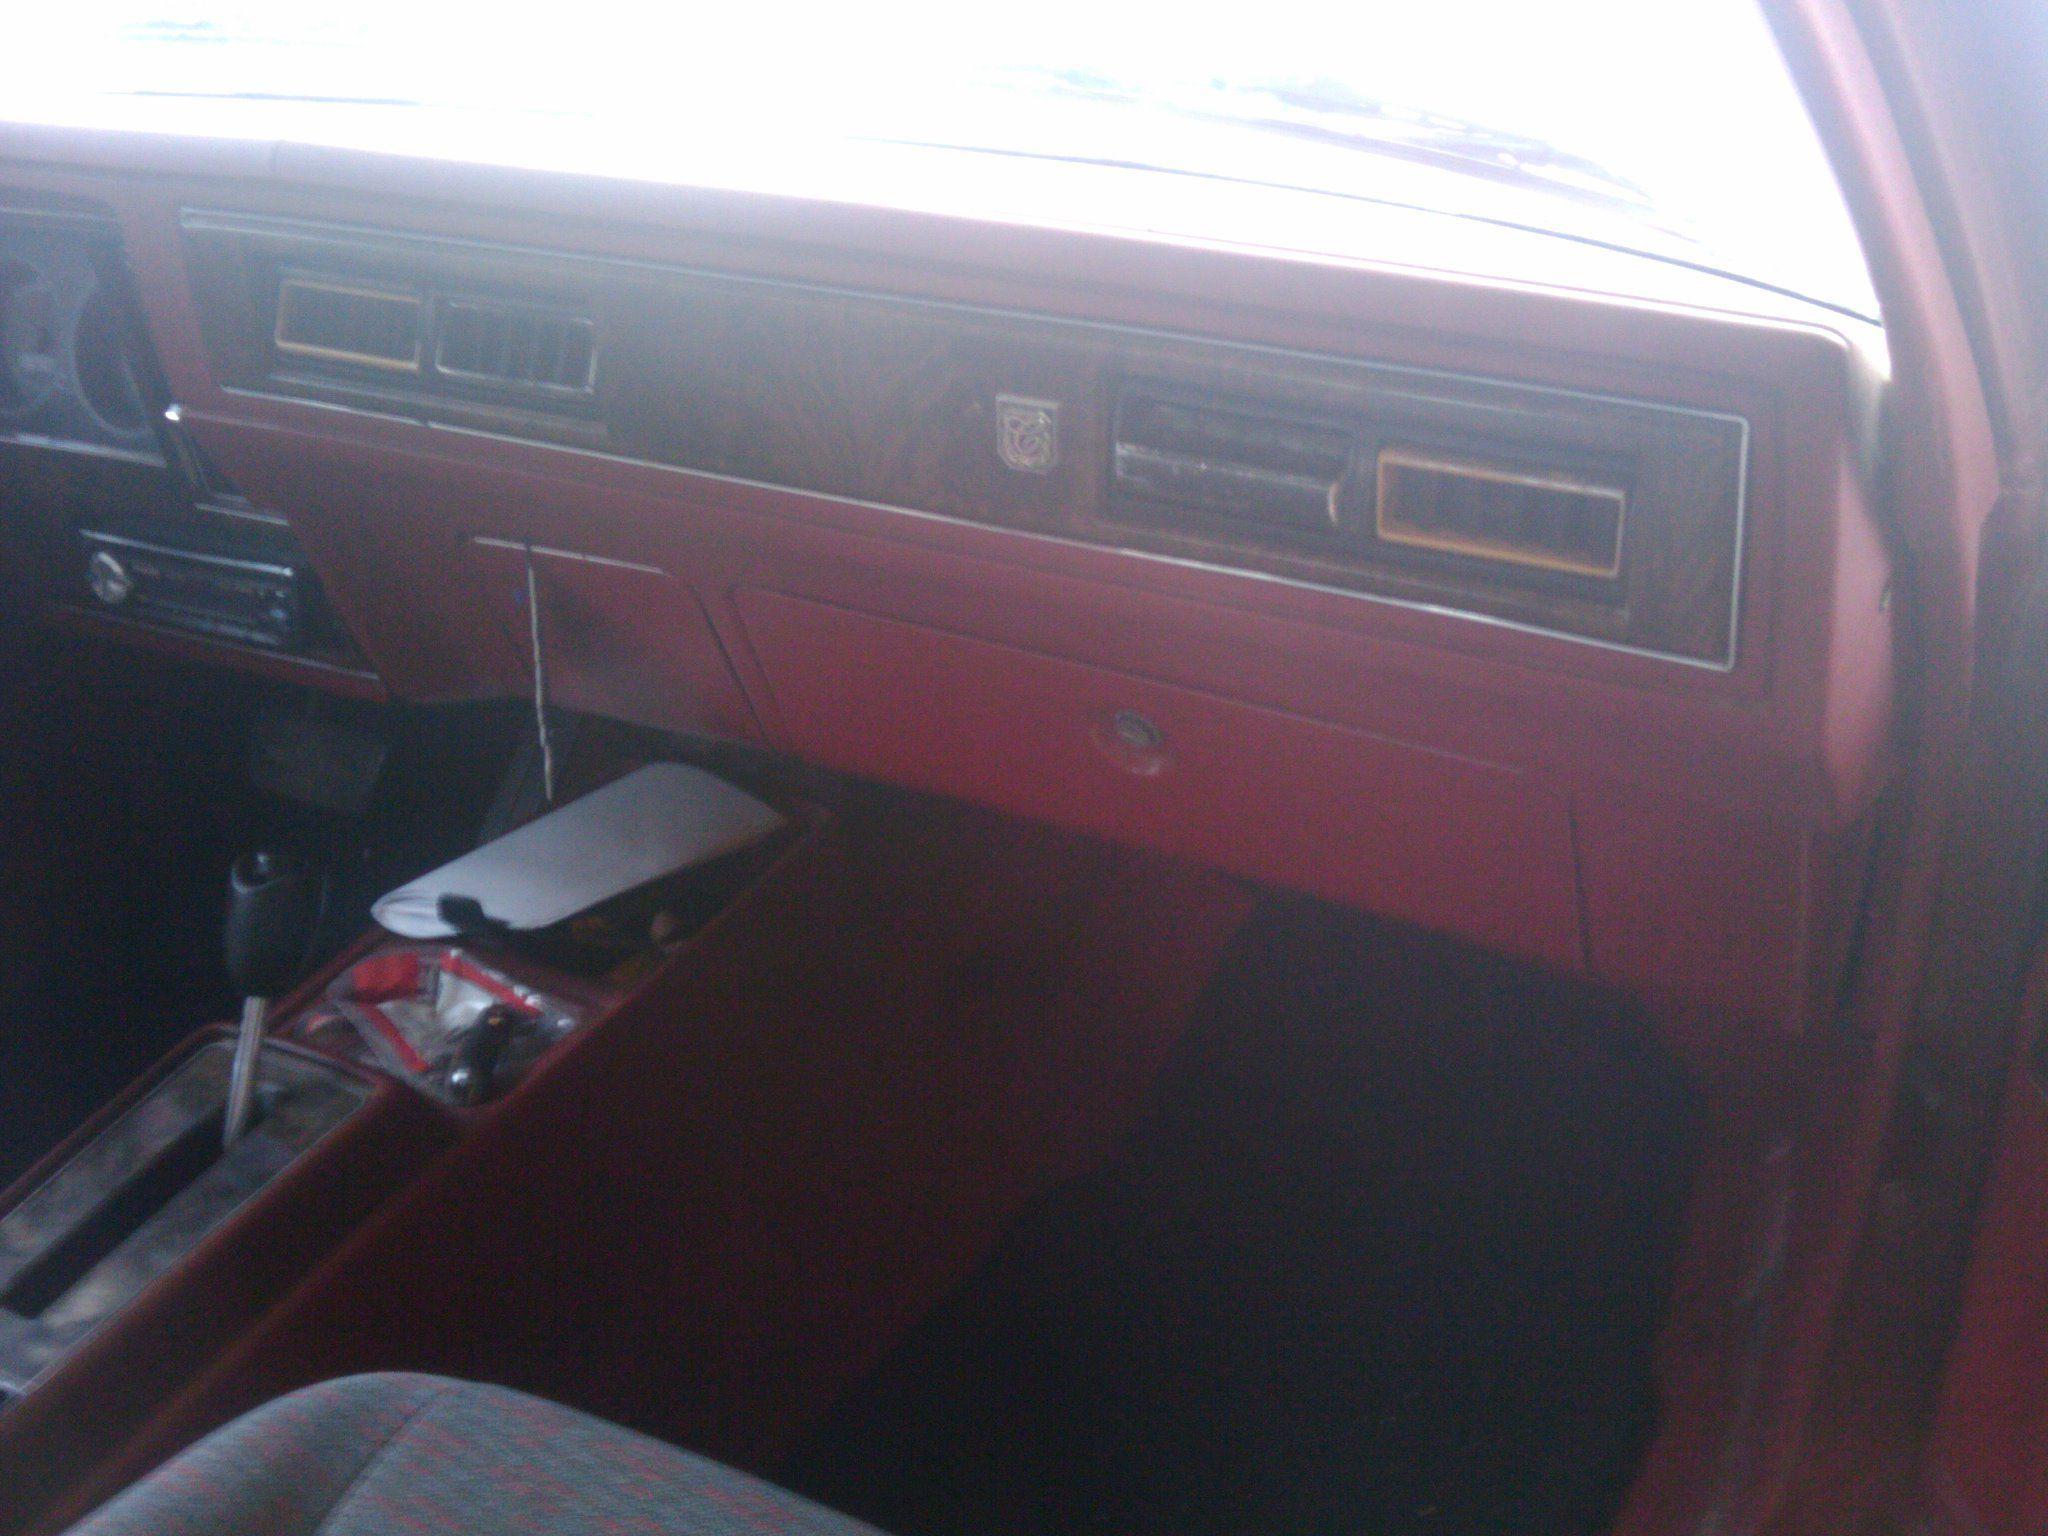 '77 Chevy Nova - News and blogs - Hot Rod Time 2010-02-13-16.07.09